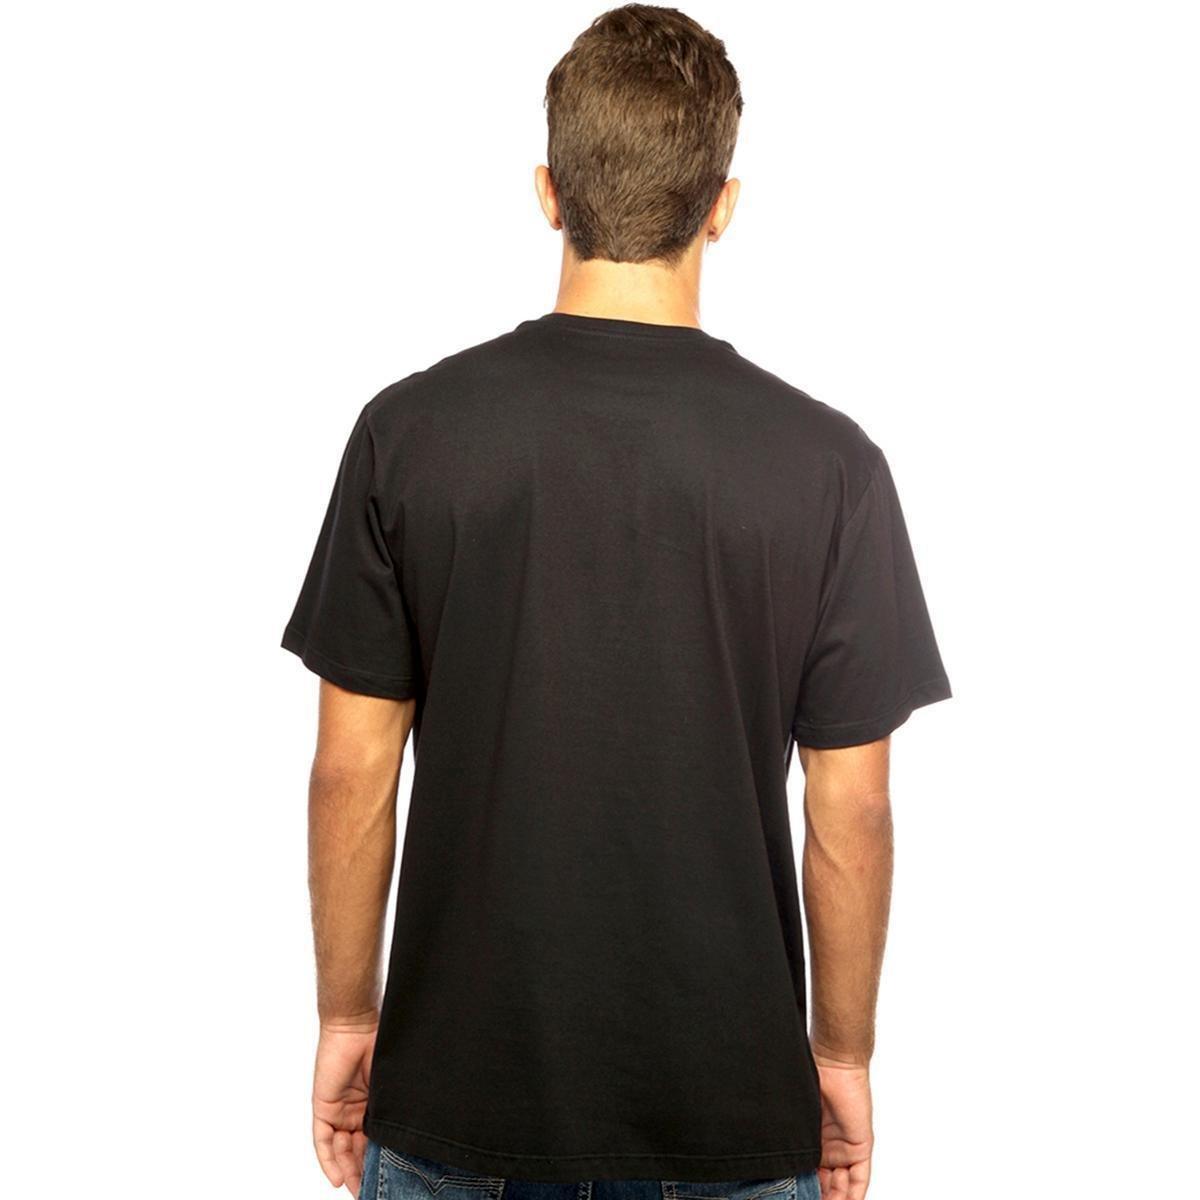 Camiseta Hardivision Sid Manga Curta Masculina - Preto